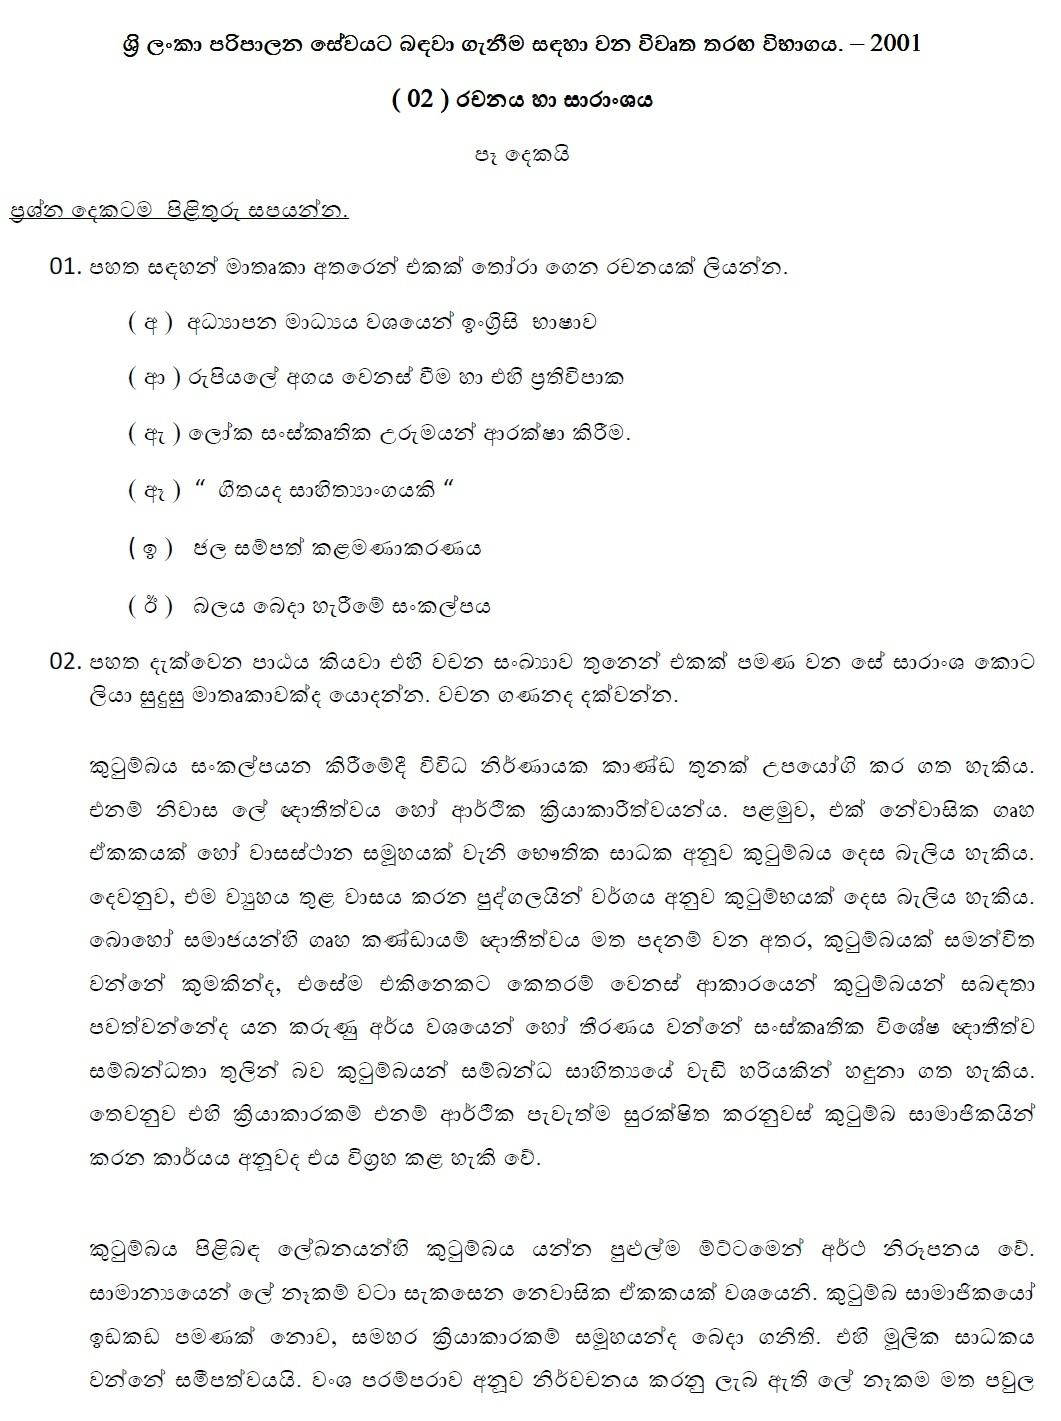 English literature past papers sri lanka - GCE Advanced